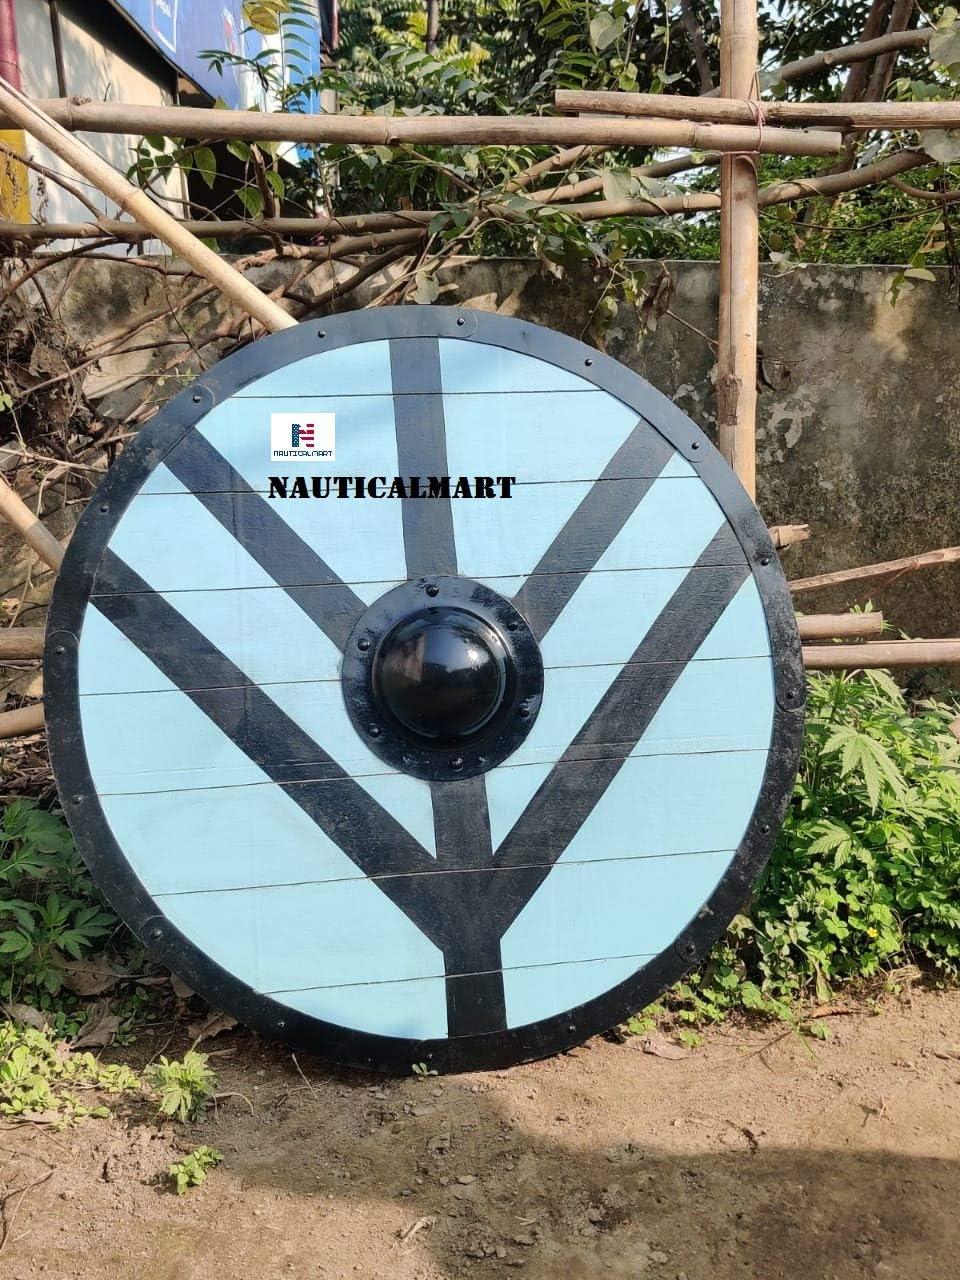 Popular brand in the world Nautical-Mart Renaissance Armor Viking Credence Shield Lagertha